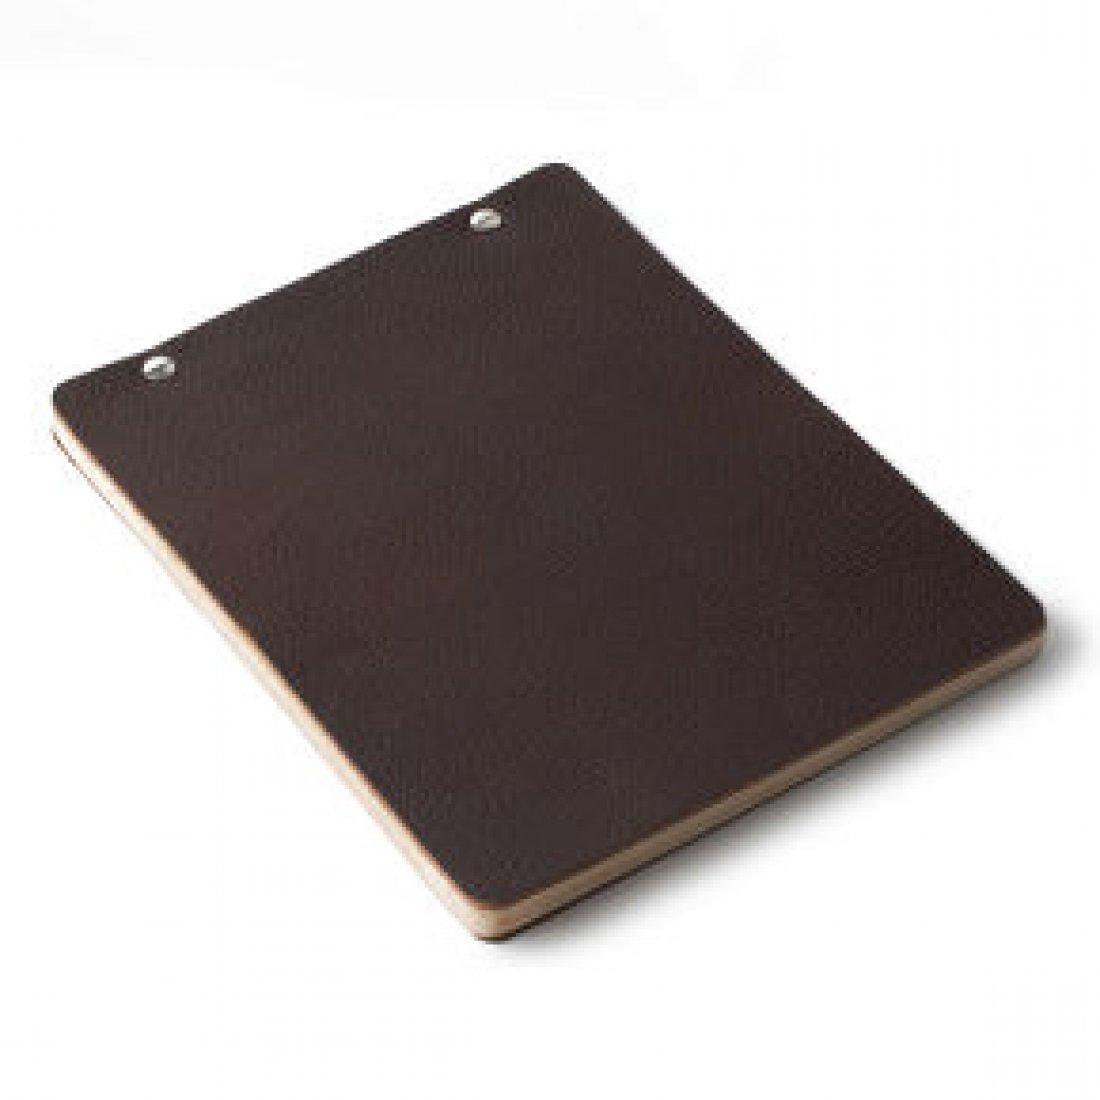 Carnet en cuir iKraft - Cohiba